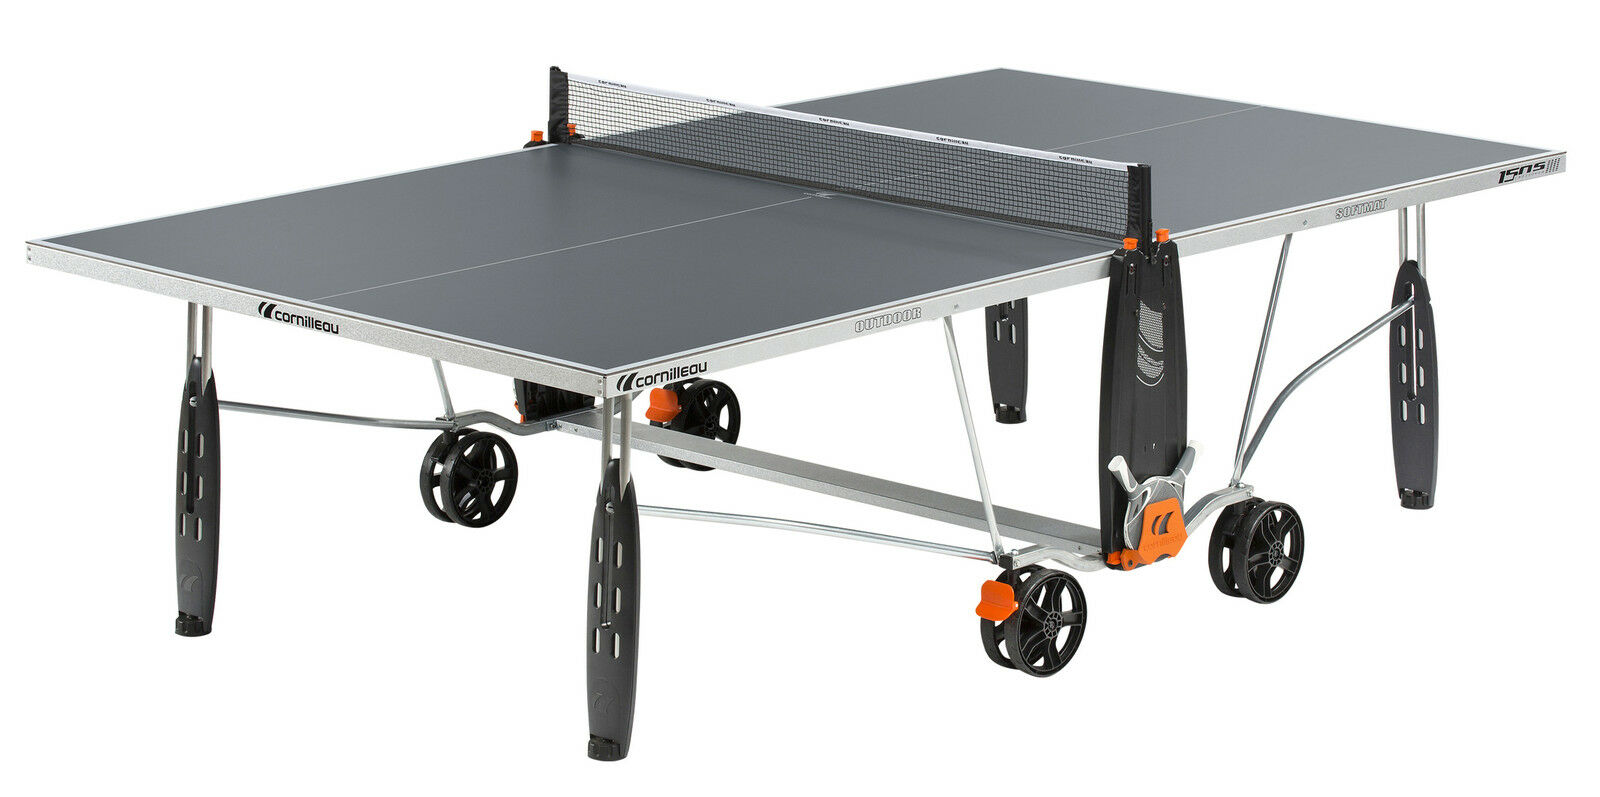 NEW 131767 CORNILLEAU Sport 150S Outdoor Weatherproof Table Tennis Table Grey